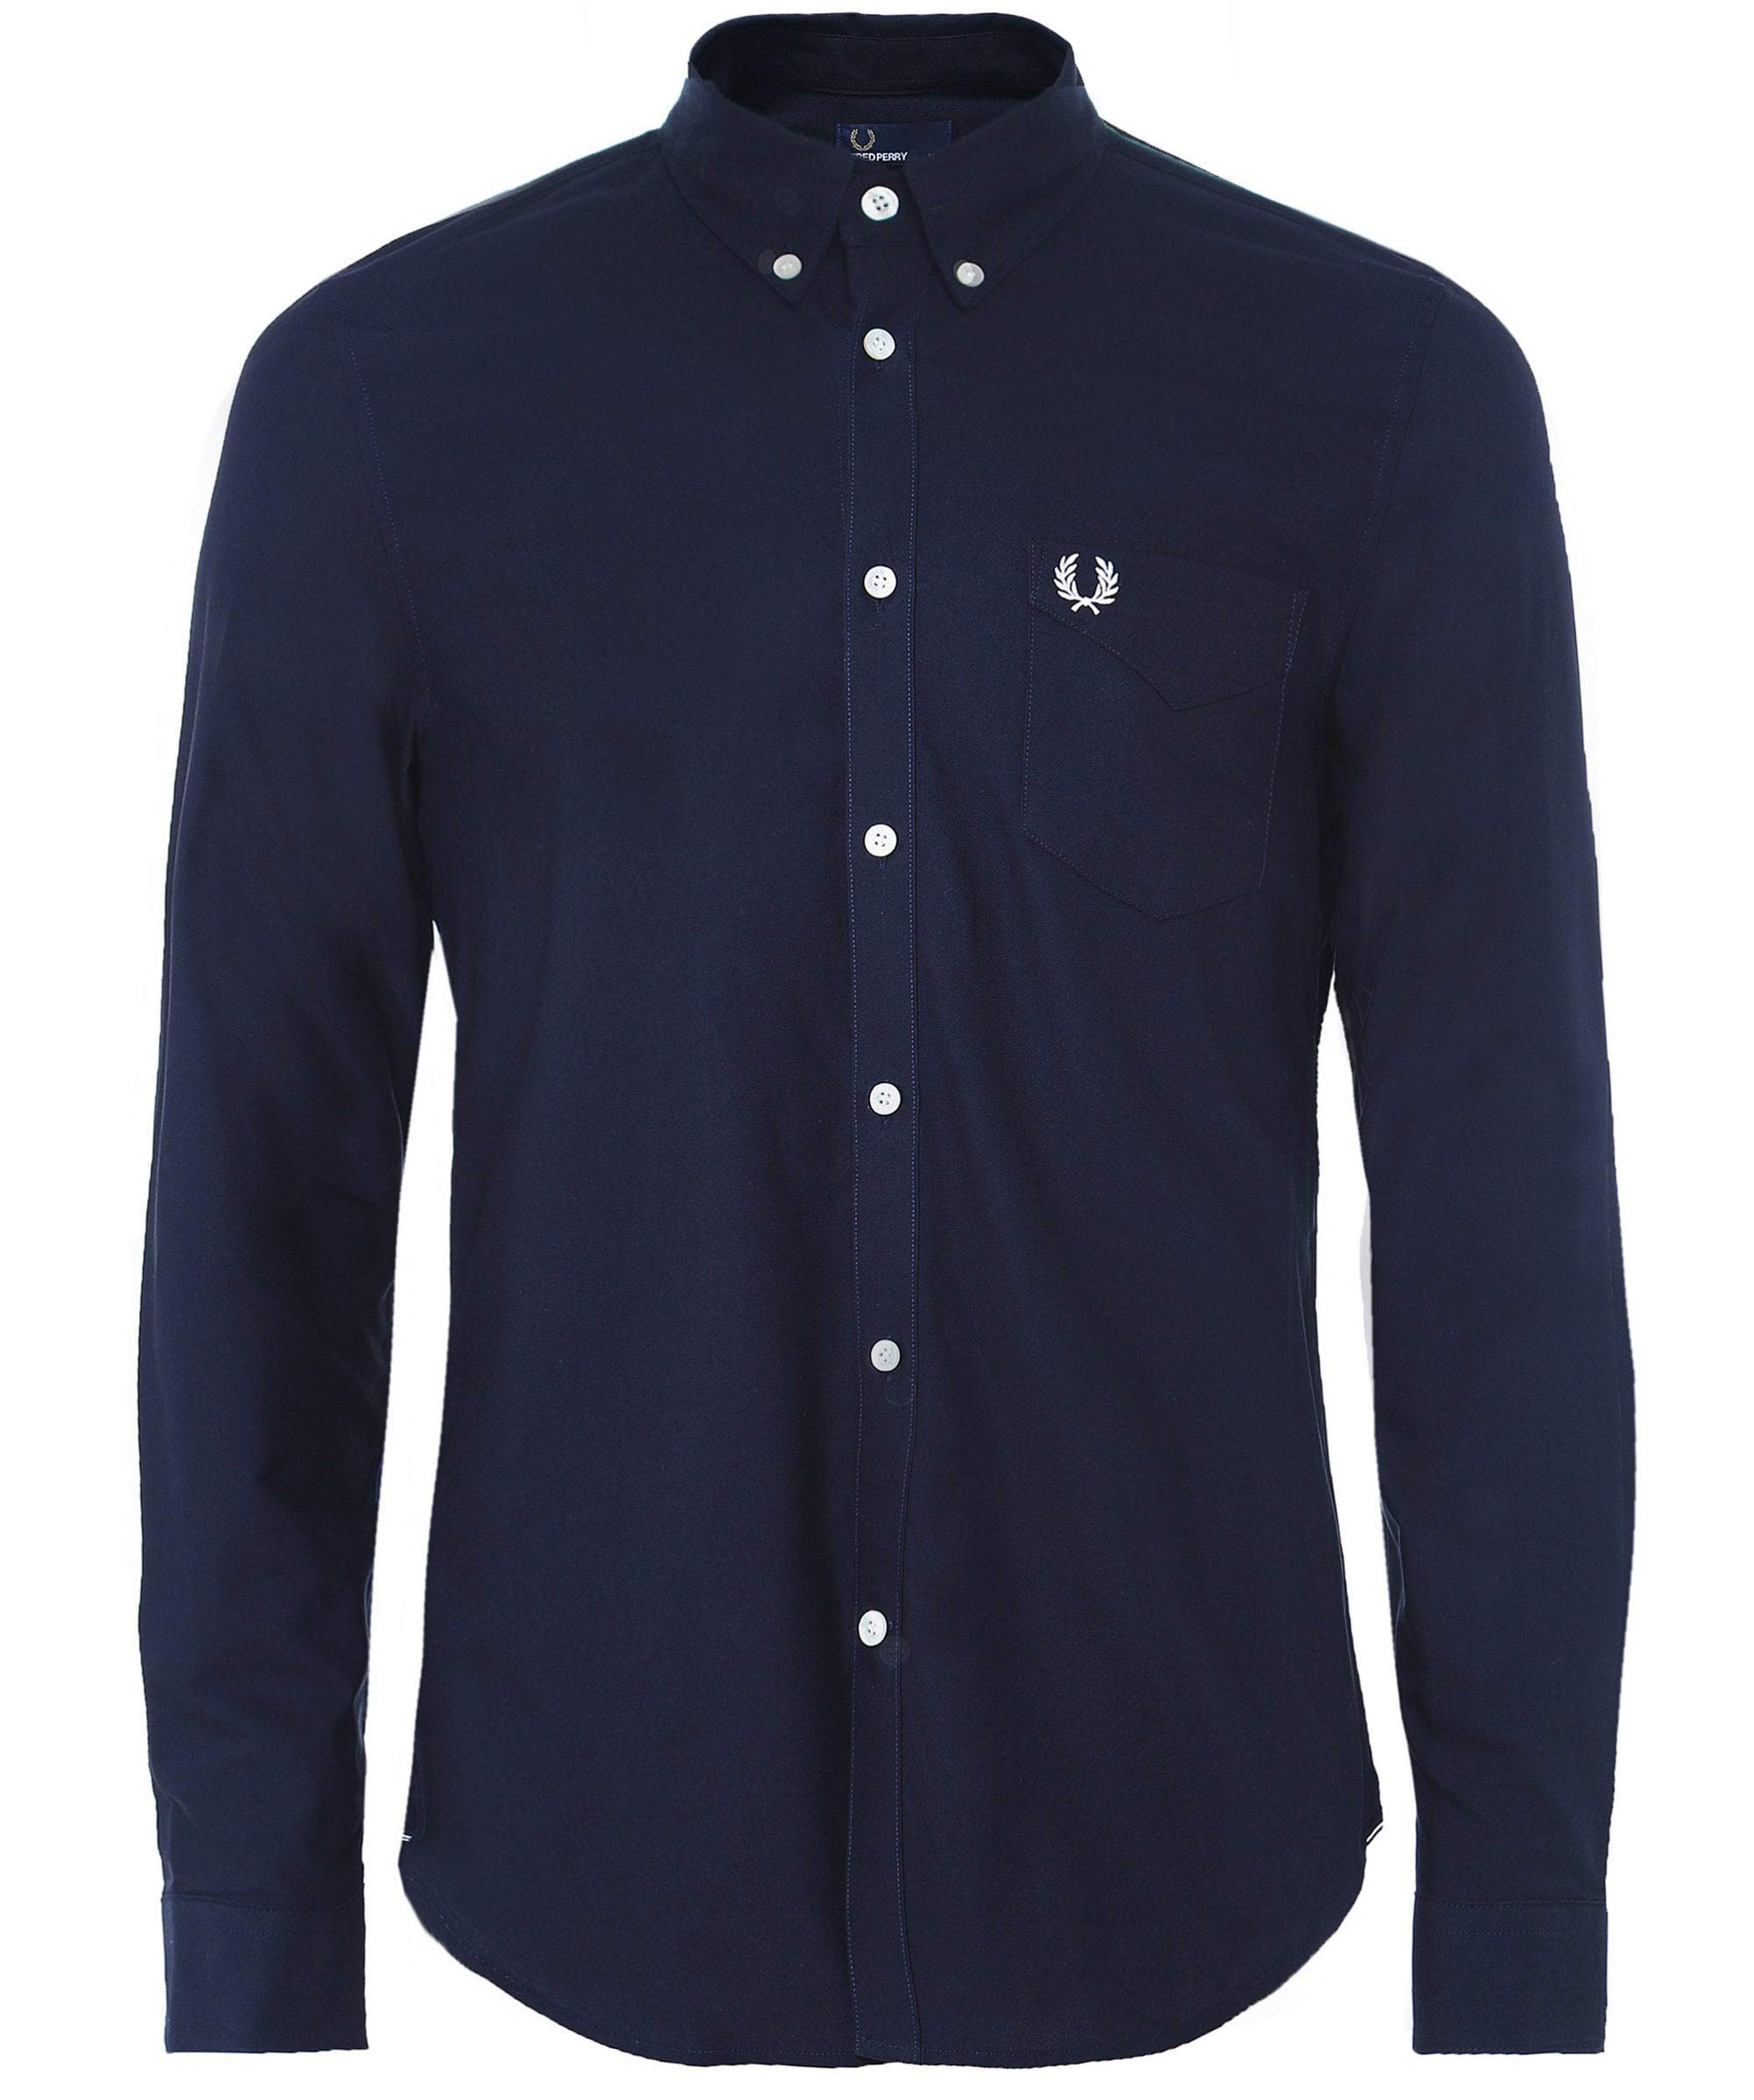 Fred Perry Men's Classic Oxford Shirt, Navy, Medium